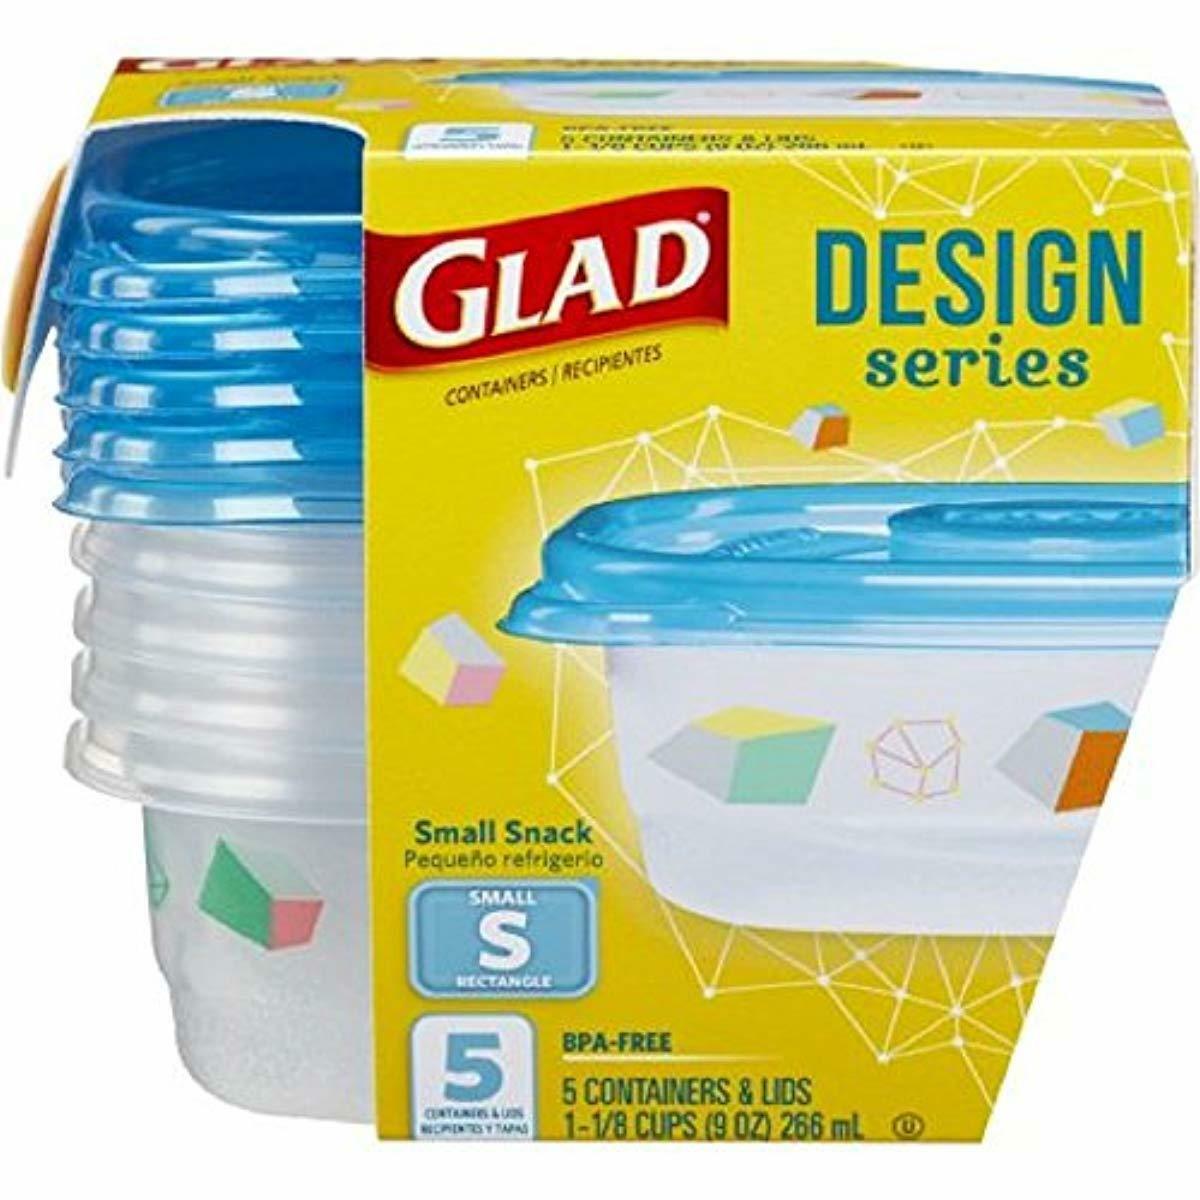 Glad Designer Series 5 Small Rectangular 9oz Containers & Li